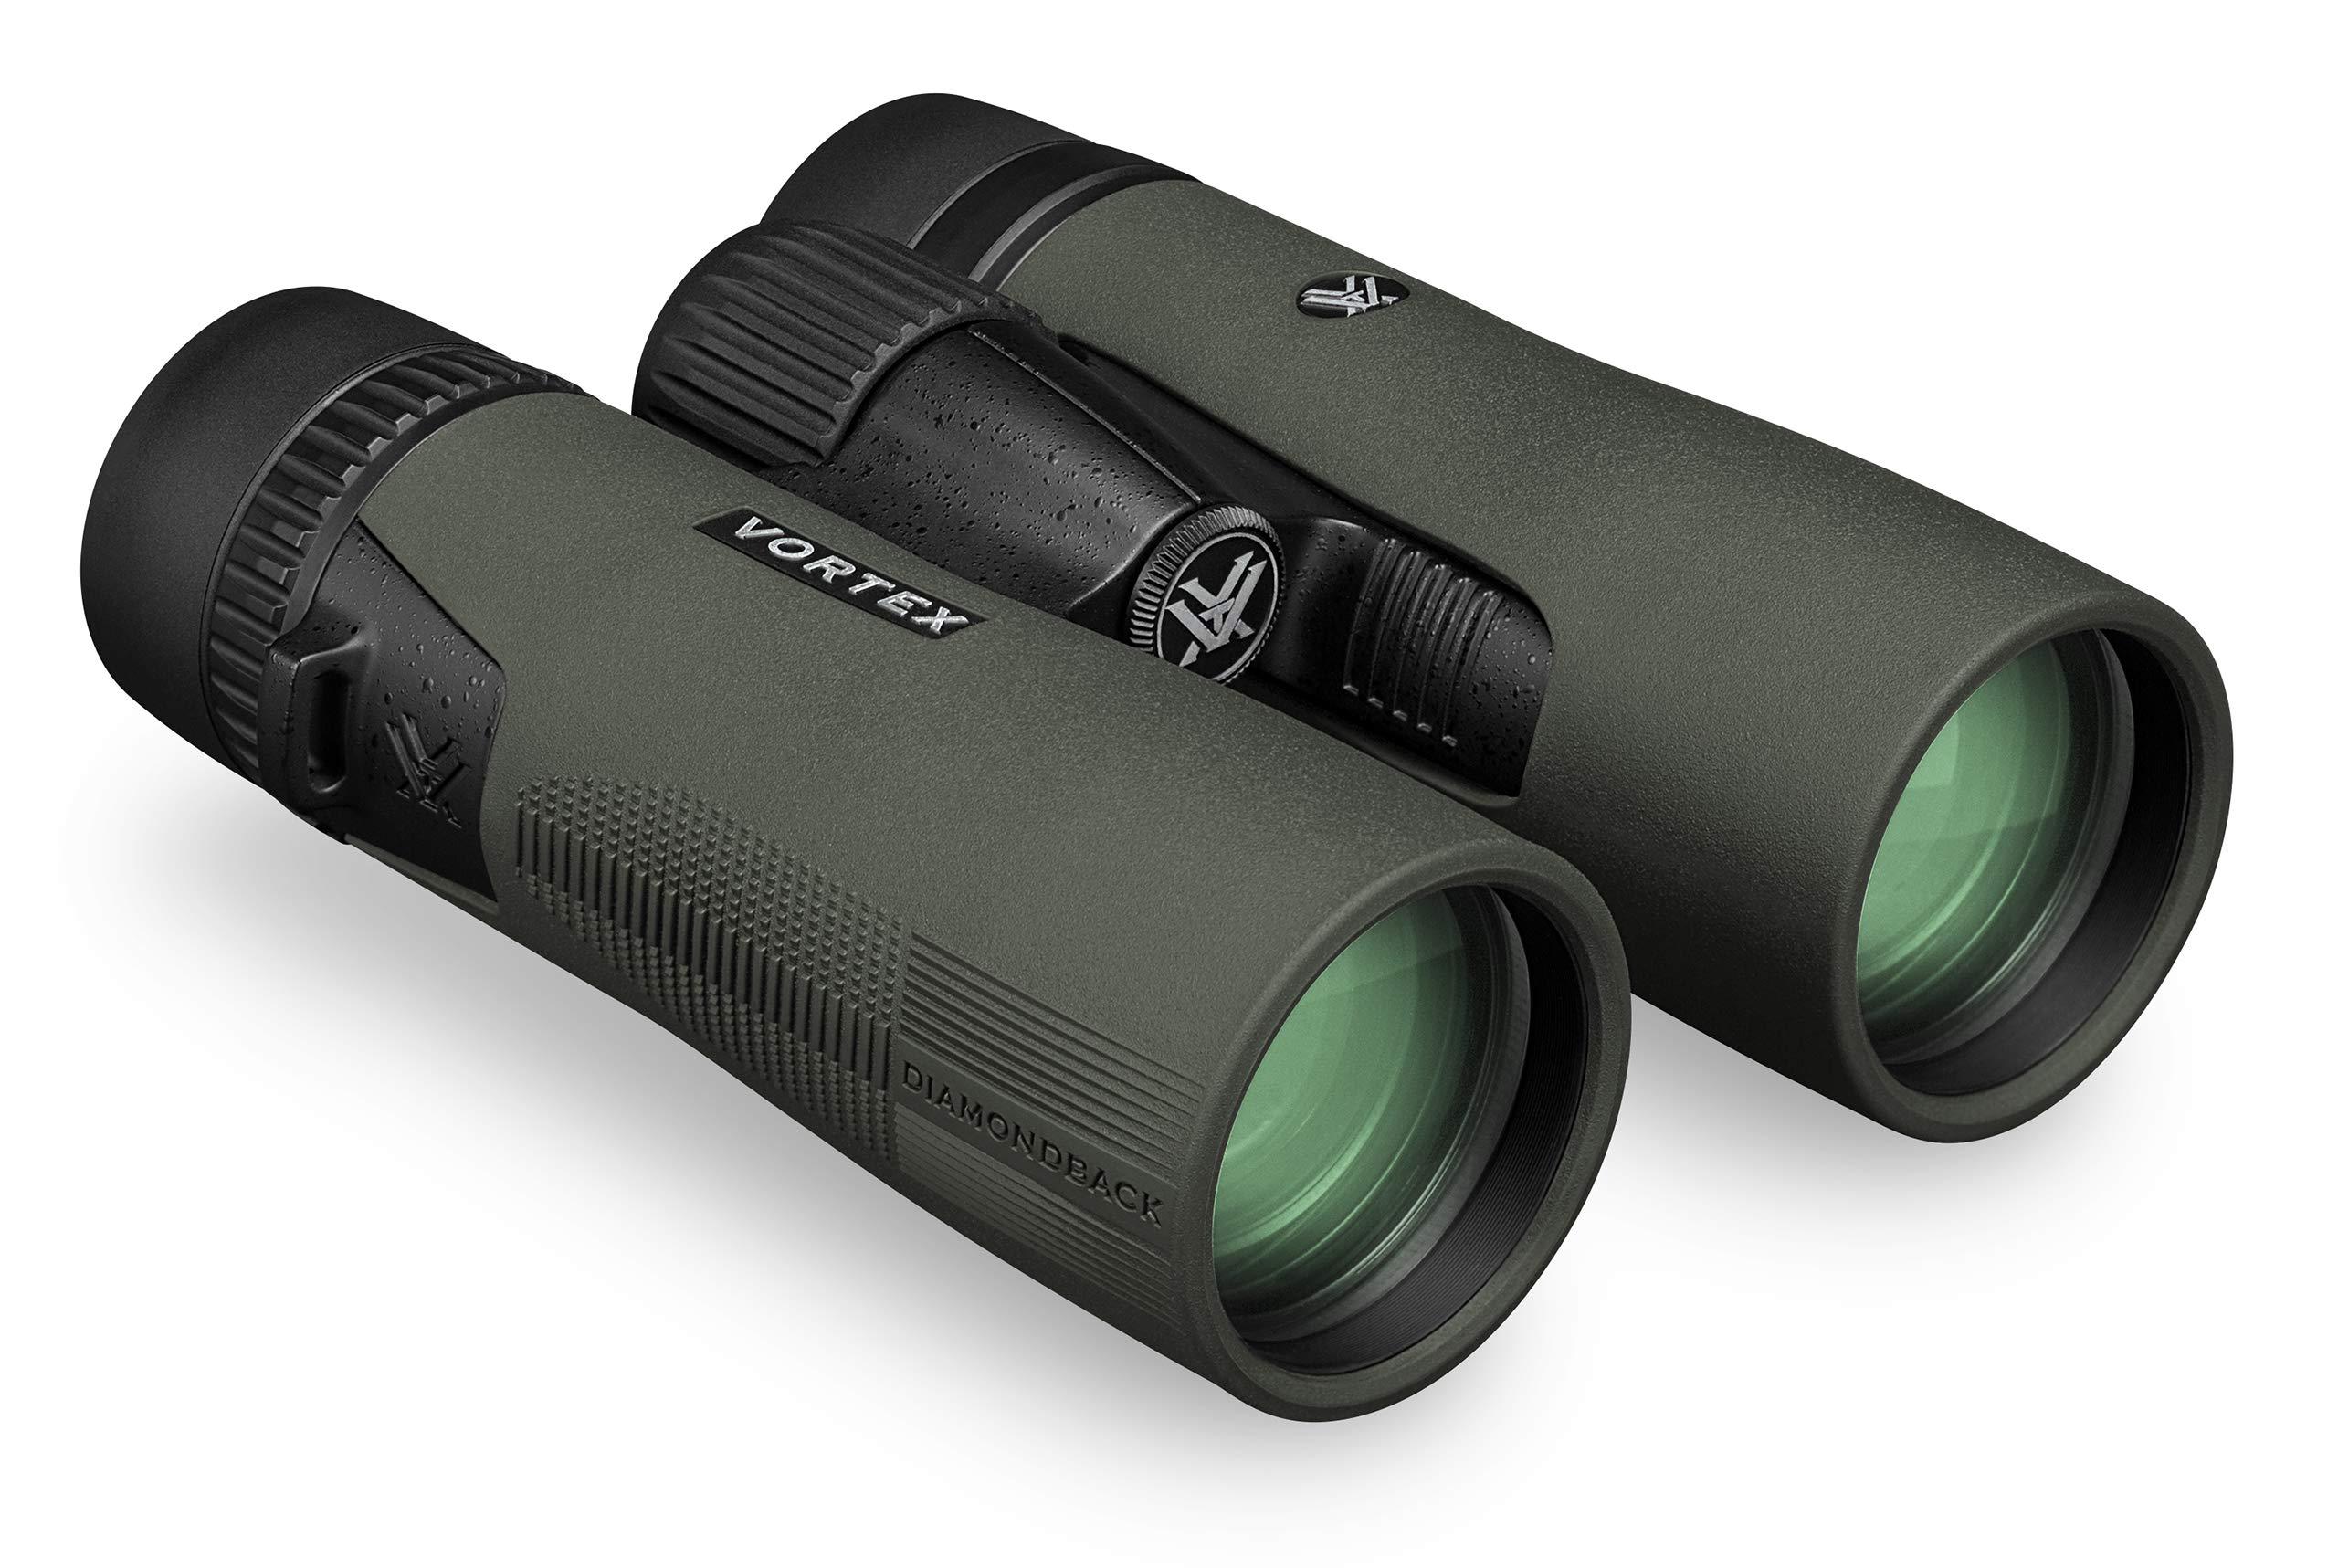 Vortex Optics Diamondback HD 8x42 Binoculars by Vortex